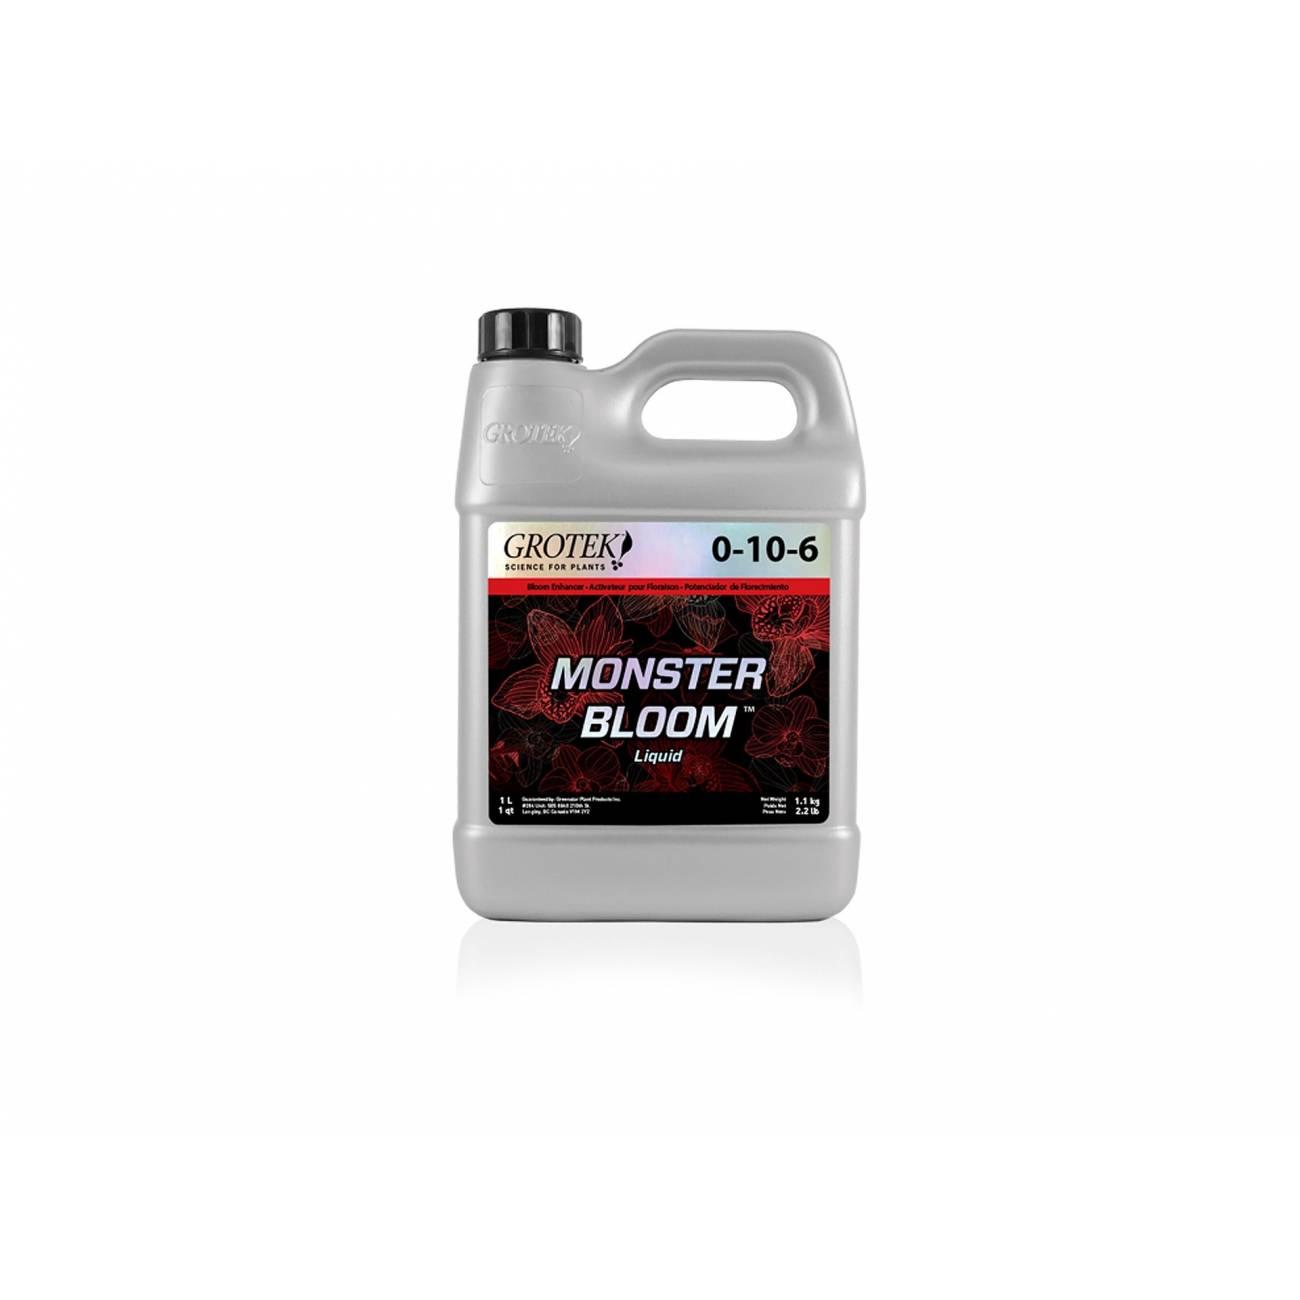 Monster Bloom Liquid (250mL/500mL/1L)